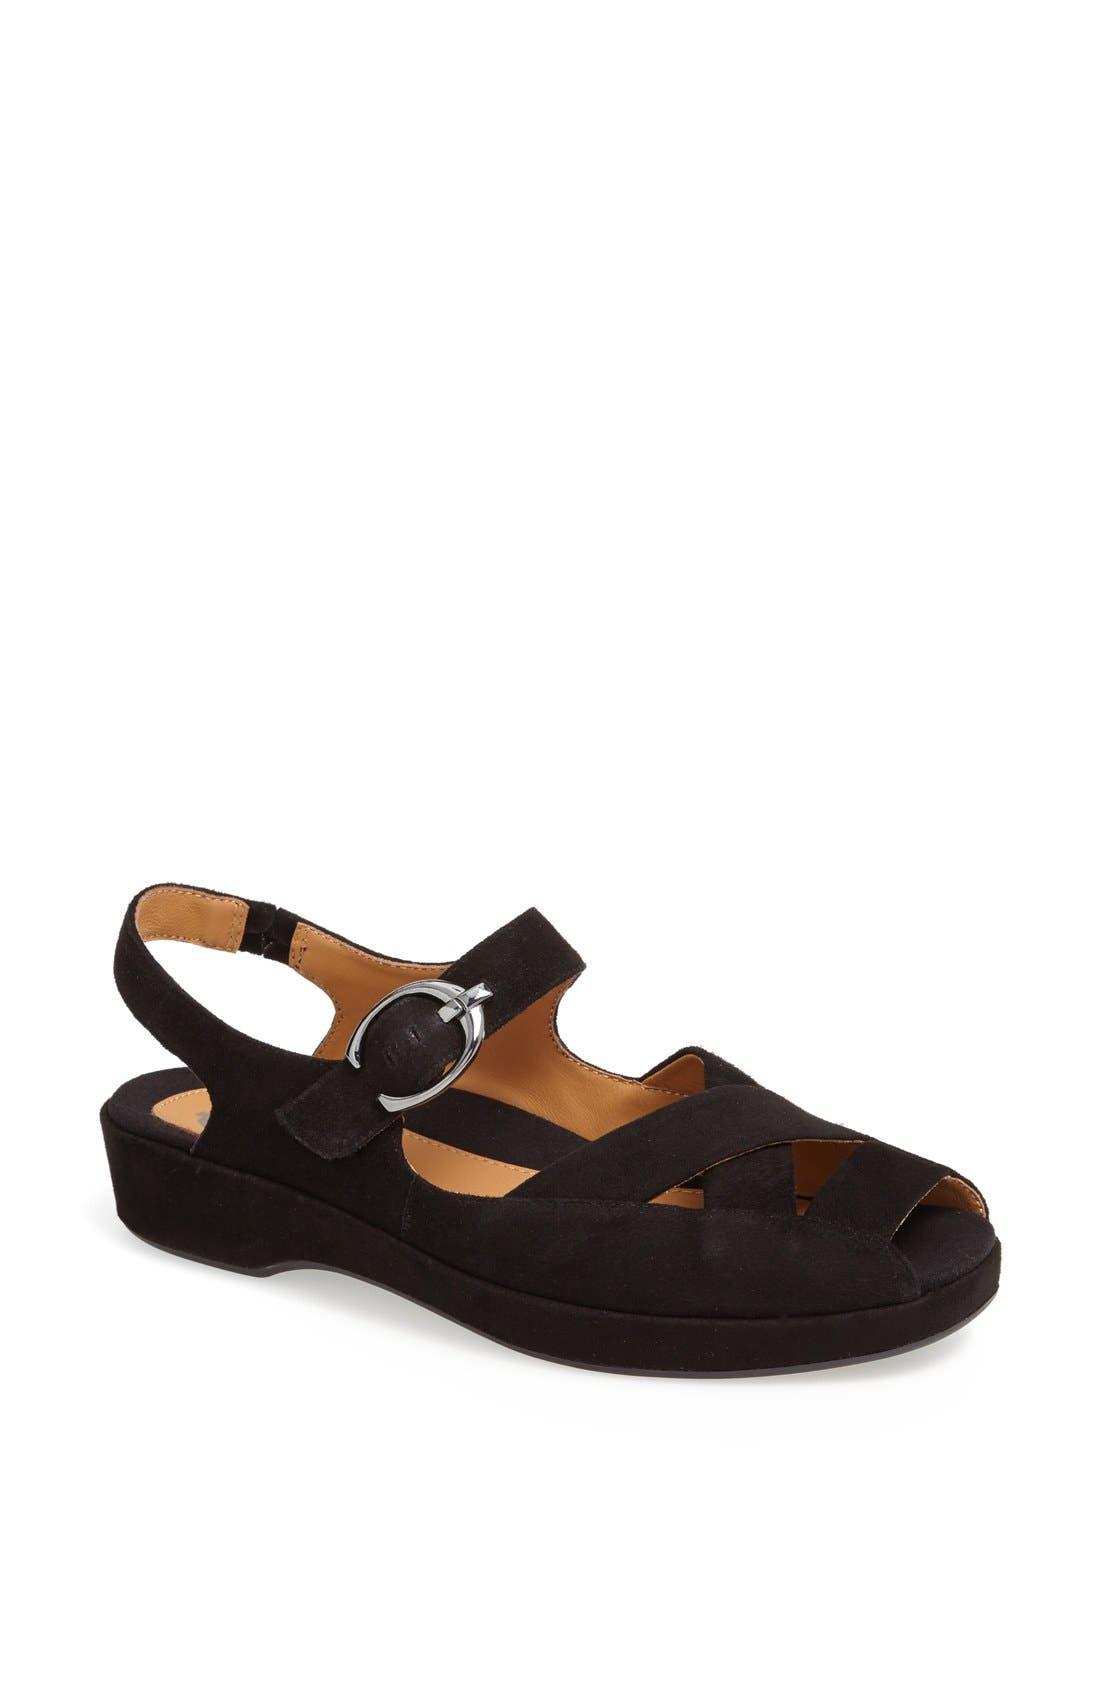 Main Image - Earthies® 'Malina' Sandal